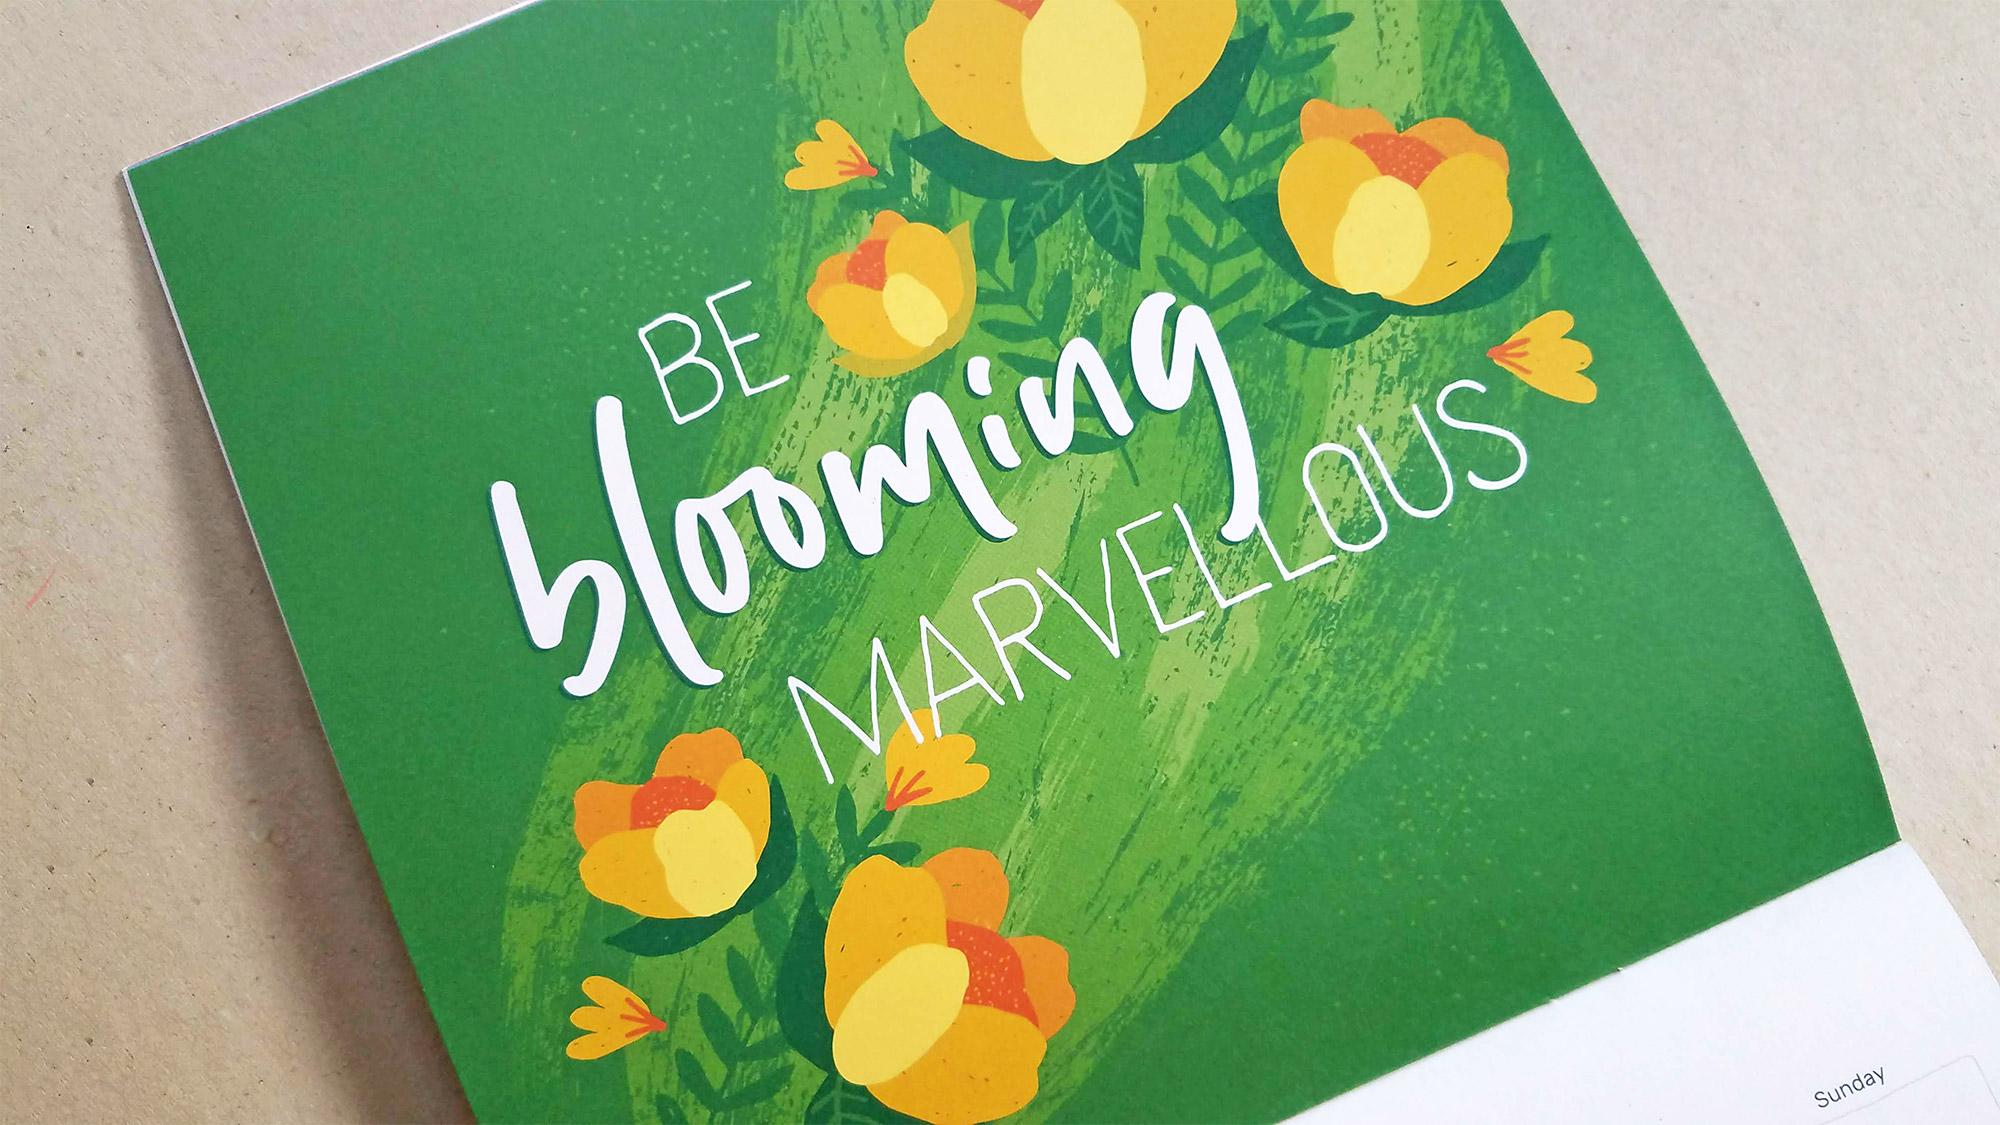 Eden Project Communities Calendar - Be blooming marvelous - April